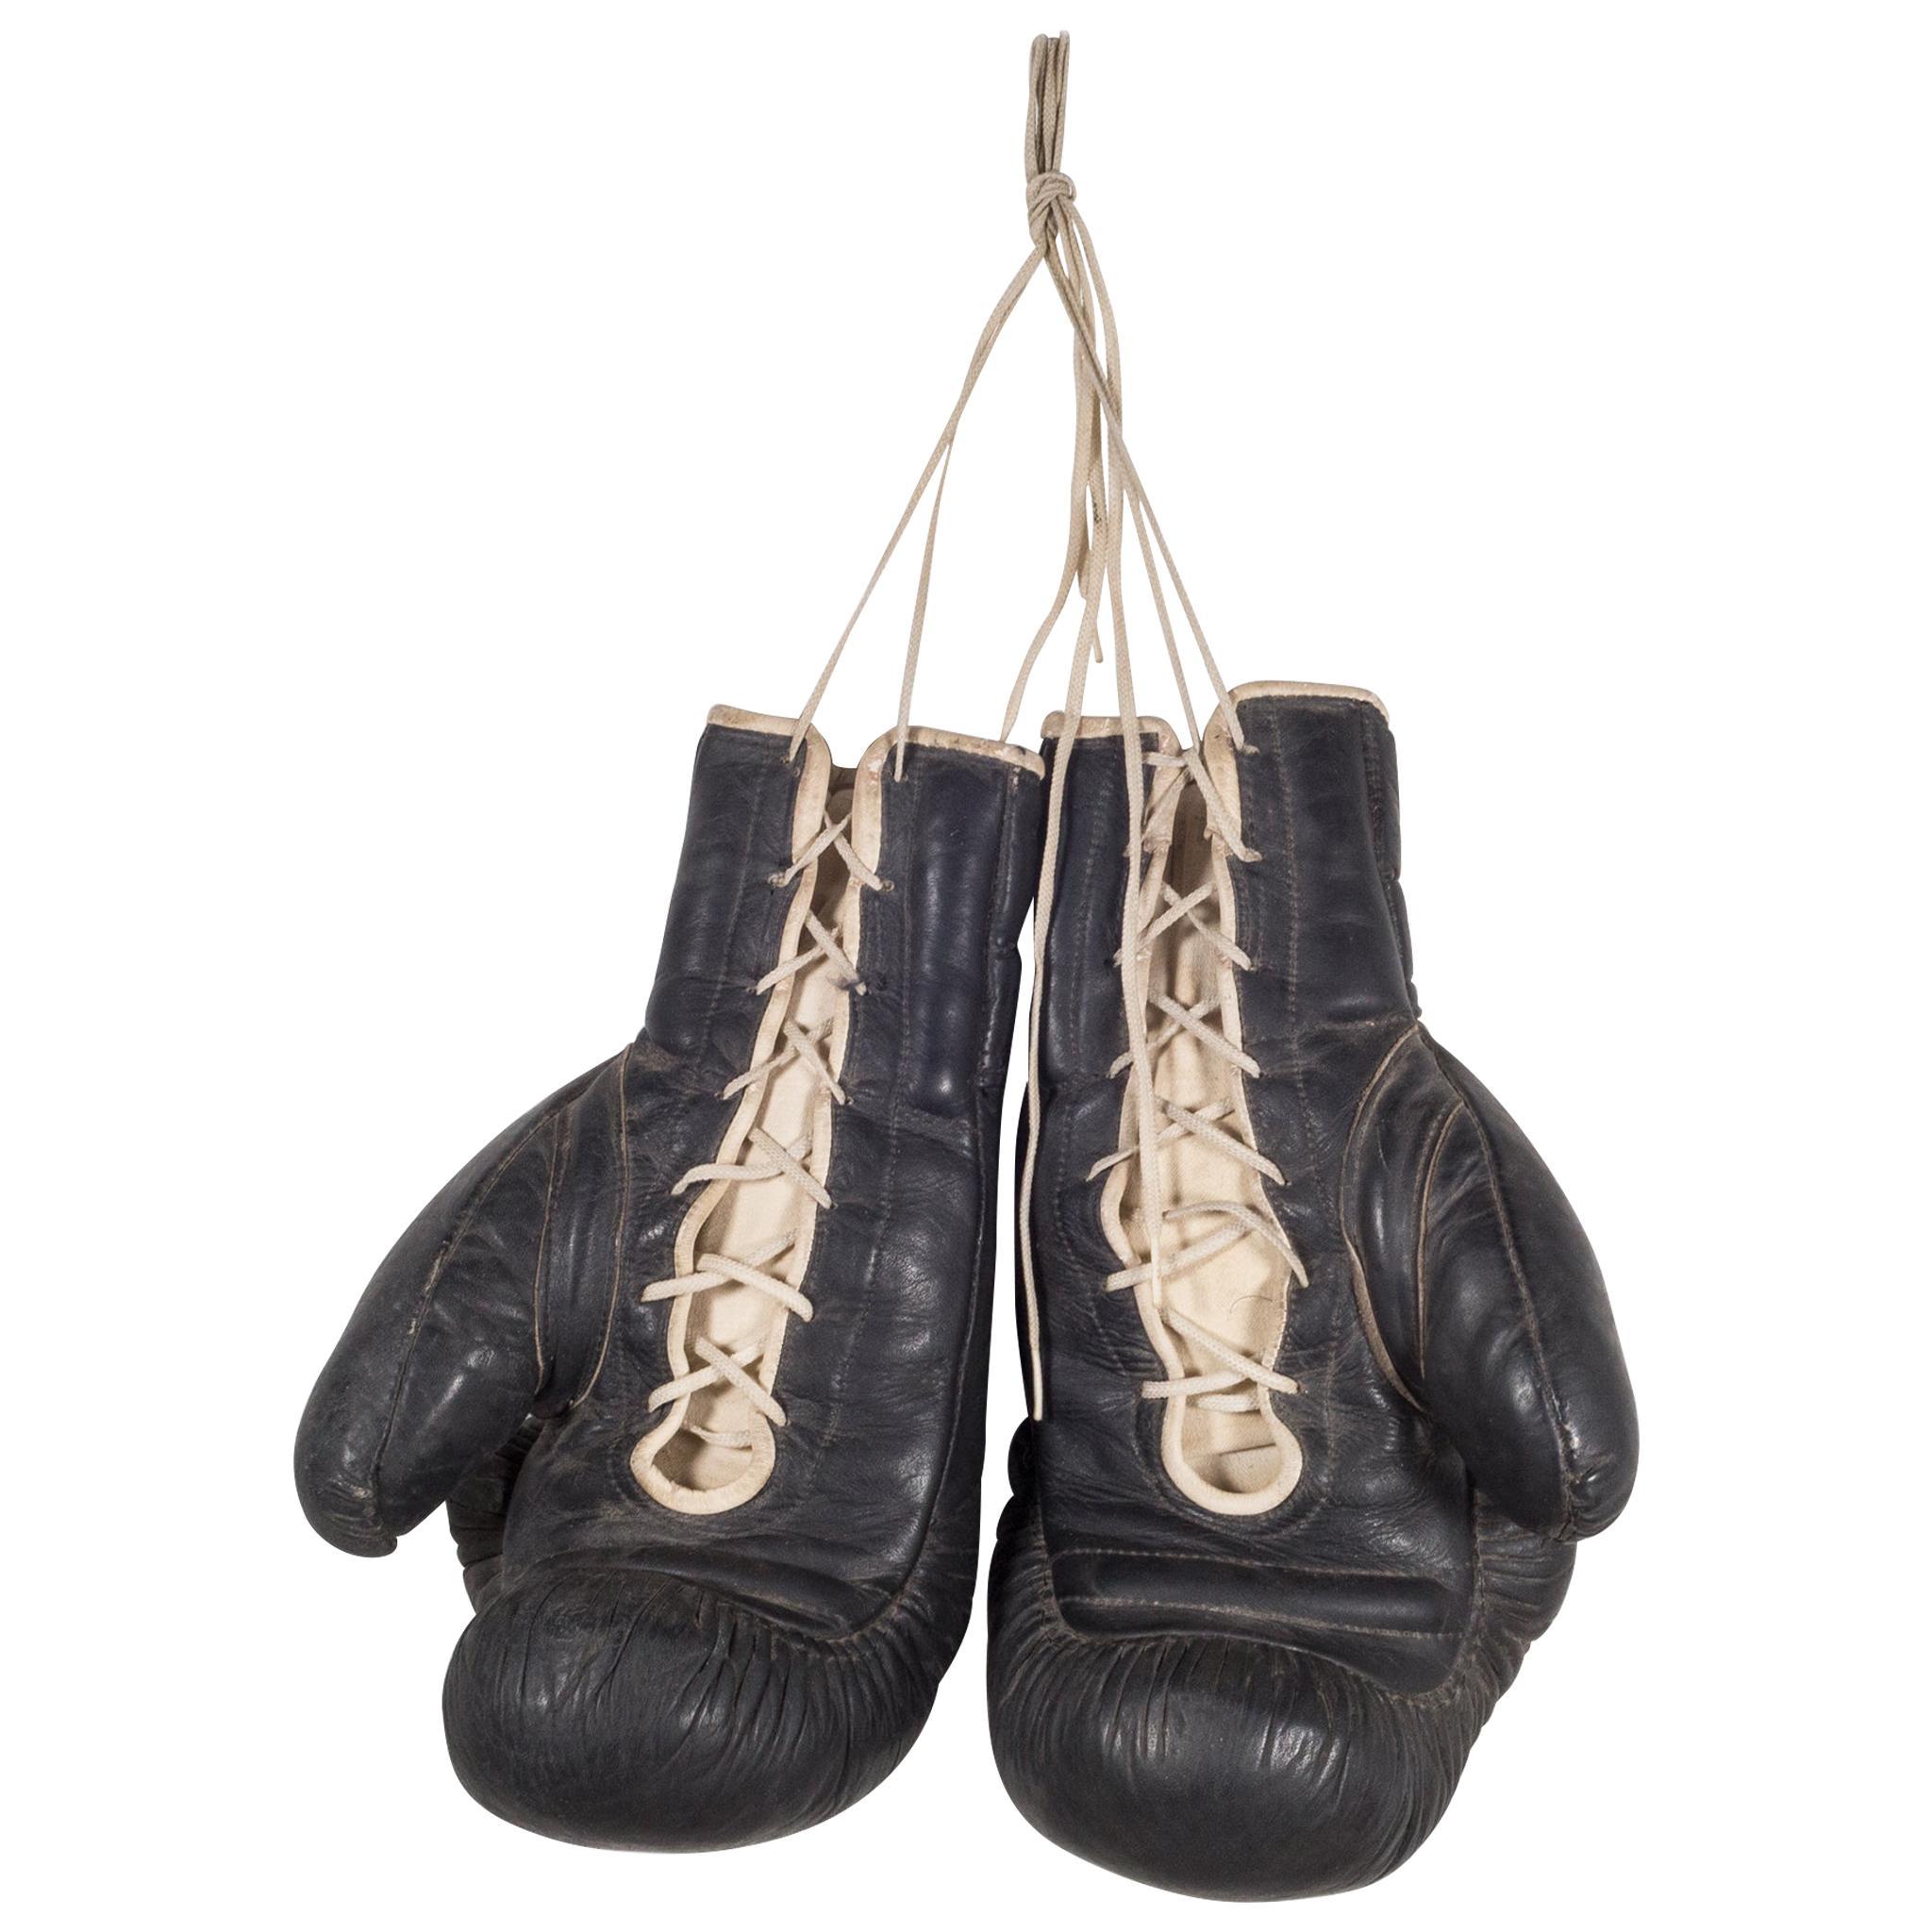 Black Leather Tuf Wear Boxing Gloves, c.1970